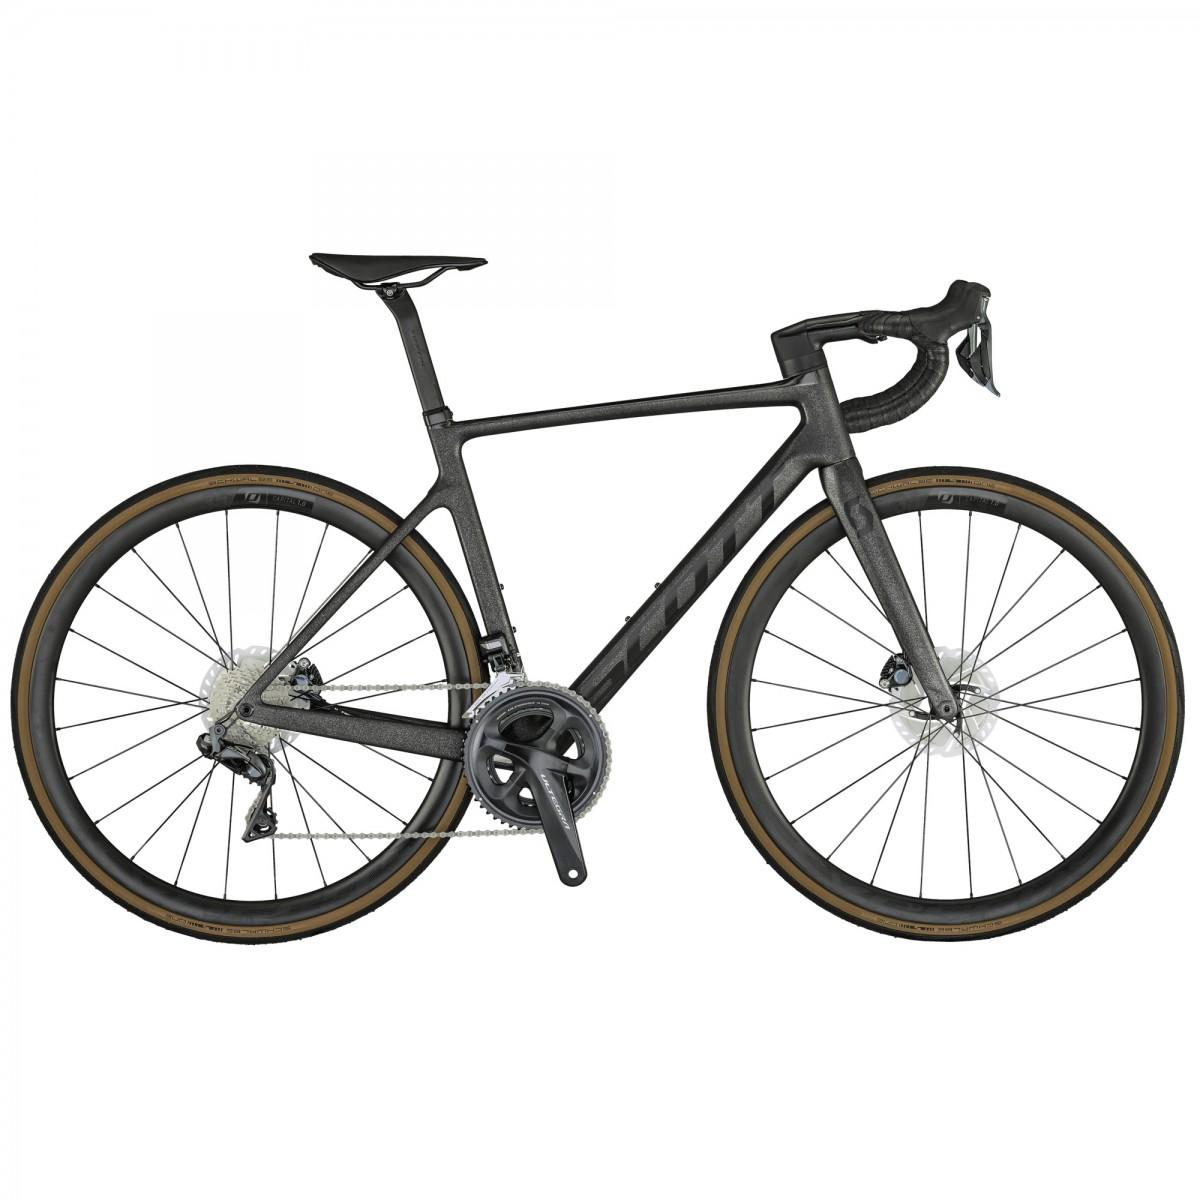 Bicicleta SCOTT Addict RC 15 _2021 carbon onyx black